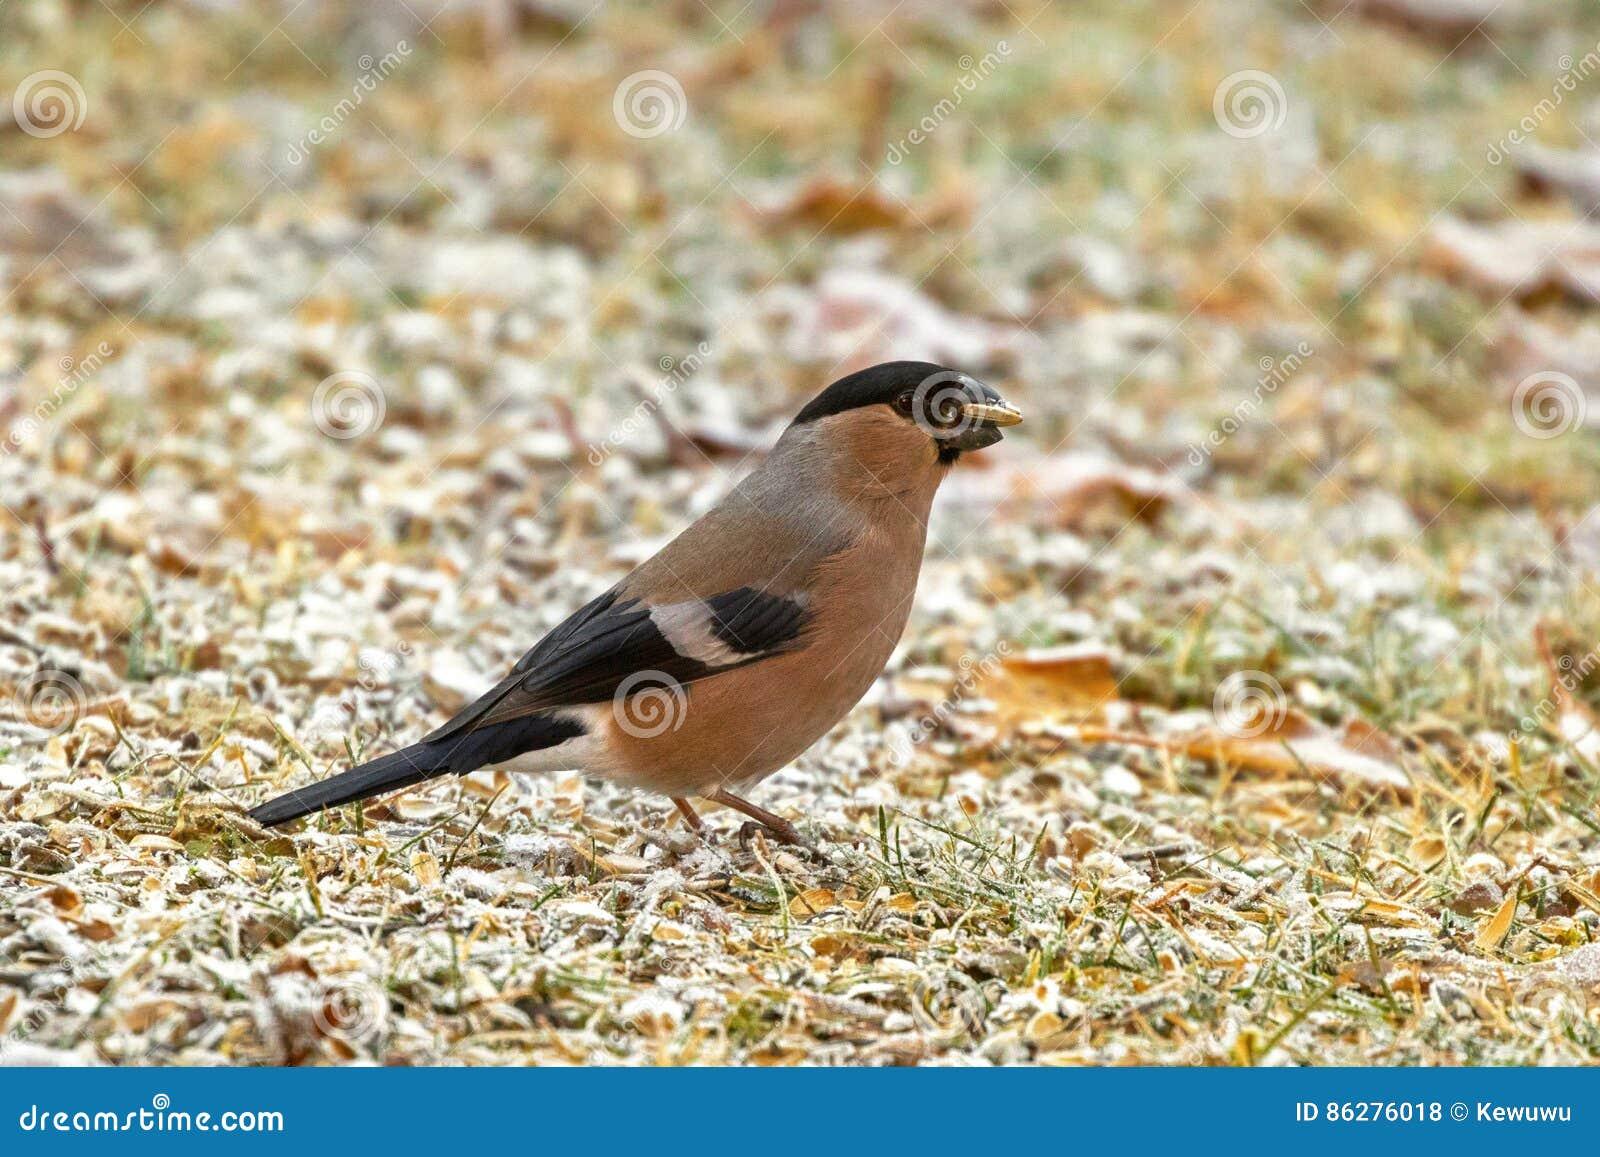 Oiseau commun eurasien femelle de bouvreuil mangeant la for Oiseau commun